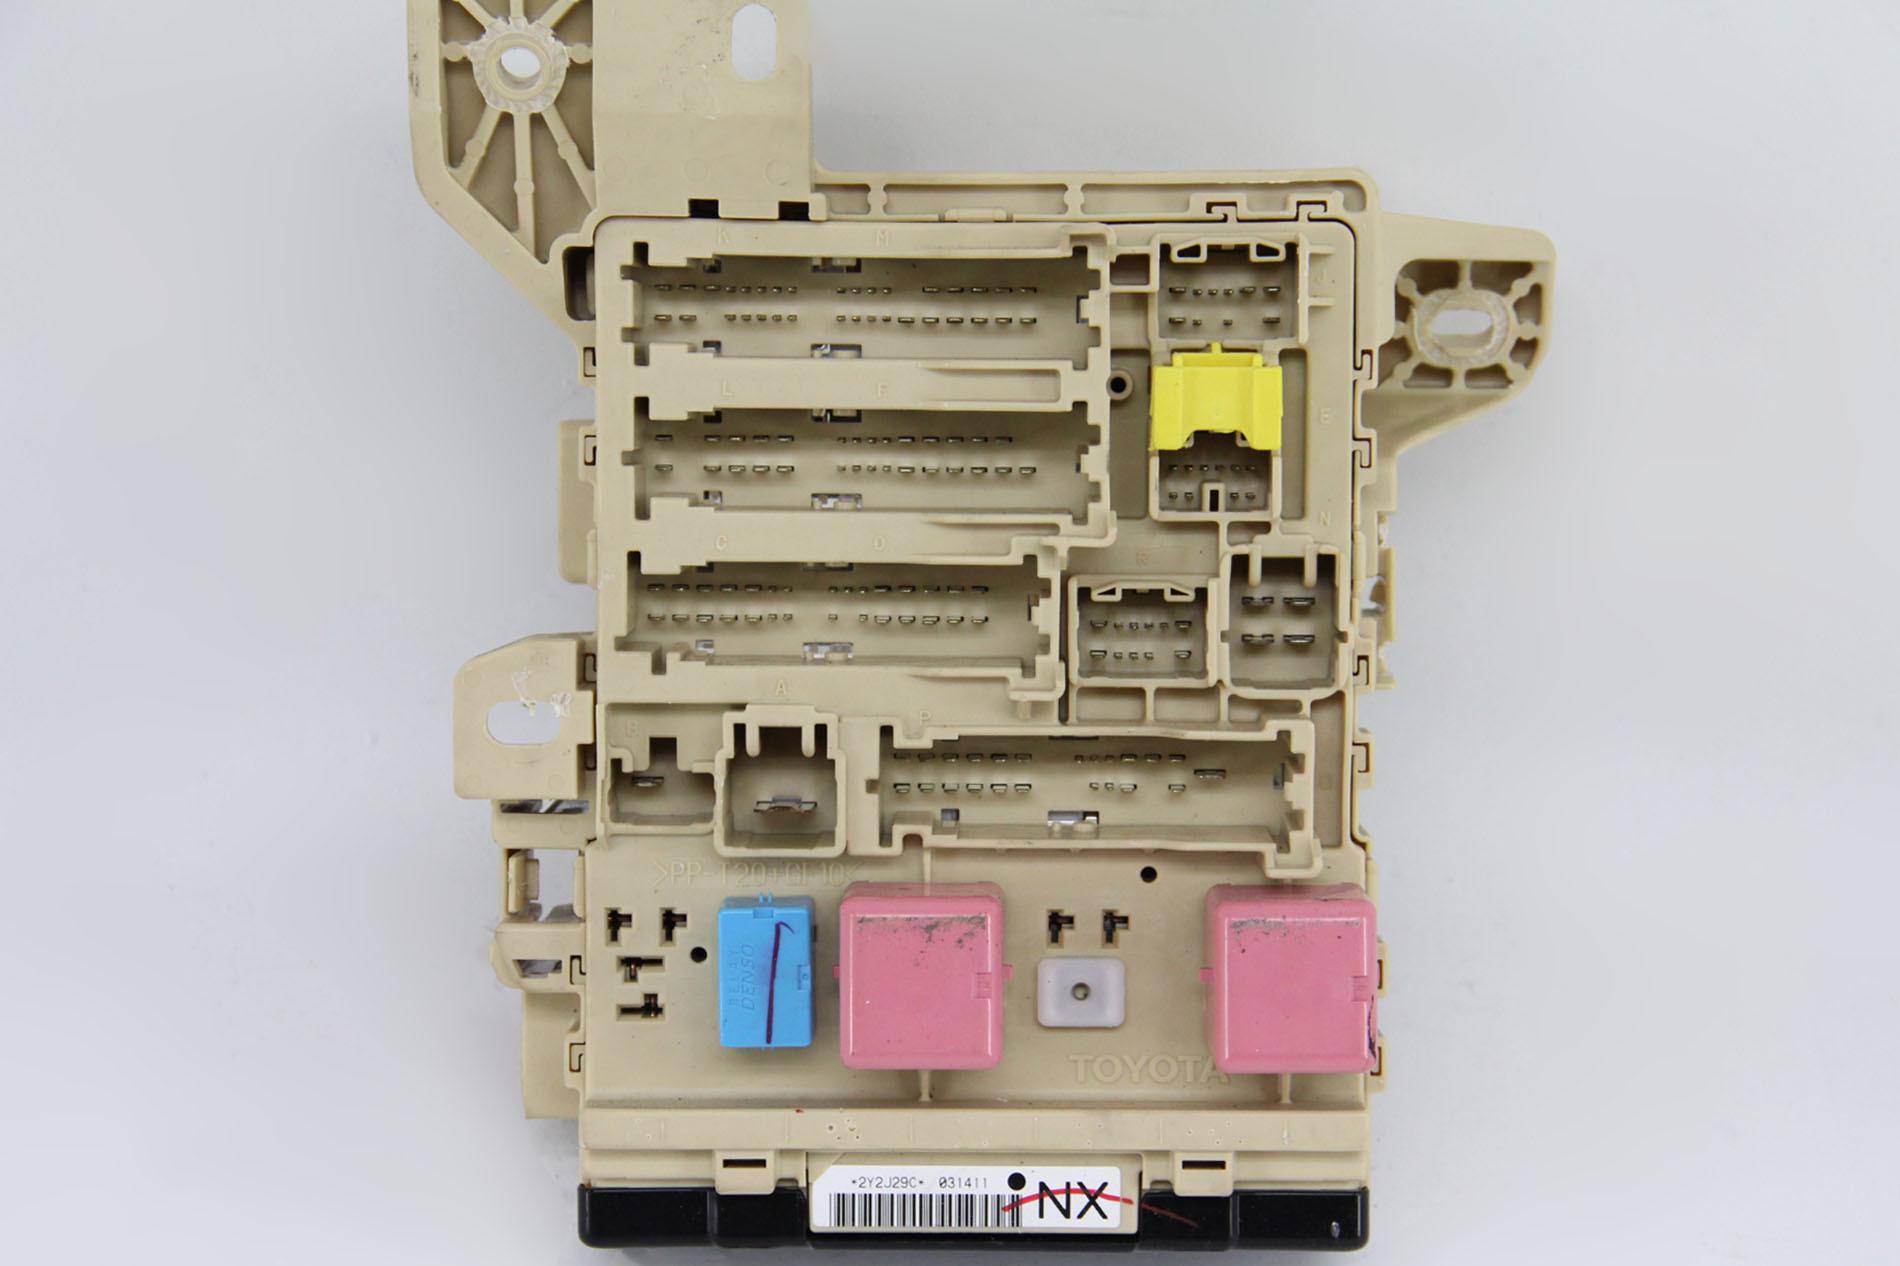 2010 Camry Hybrid Fuse Box Location Wiring Library 1994 Toyota 10 11 Relay Interior Under Dash 82730 06730